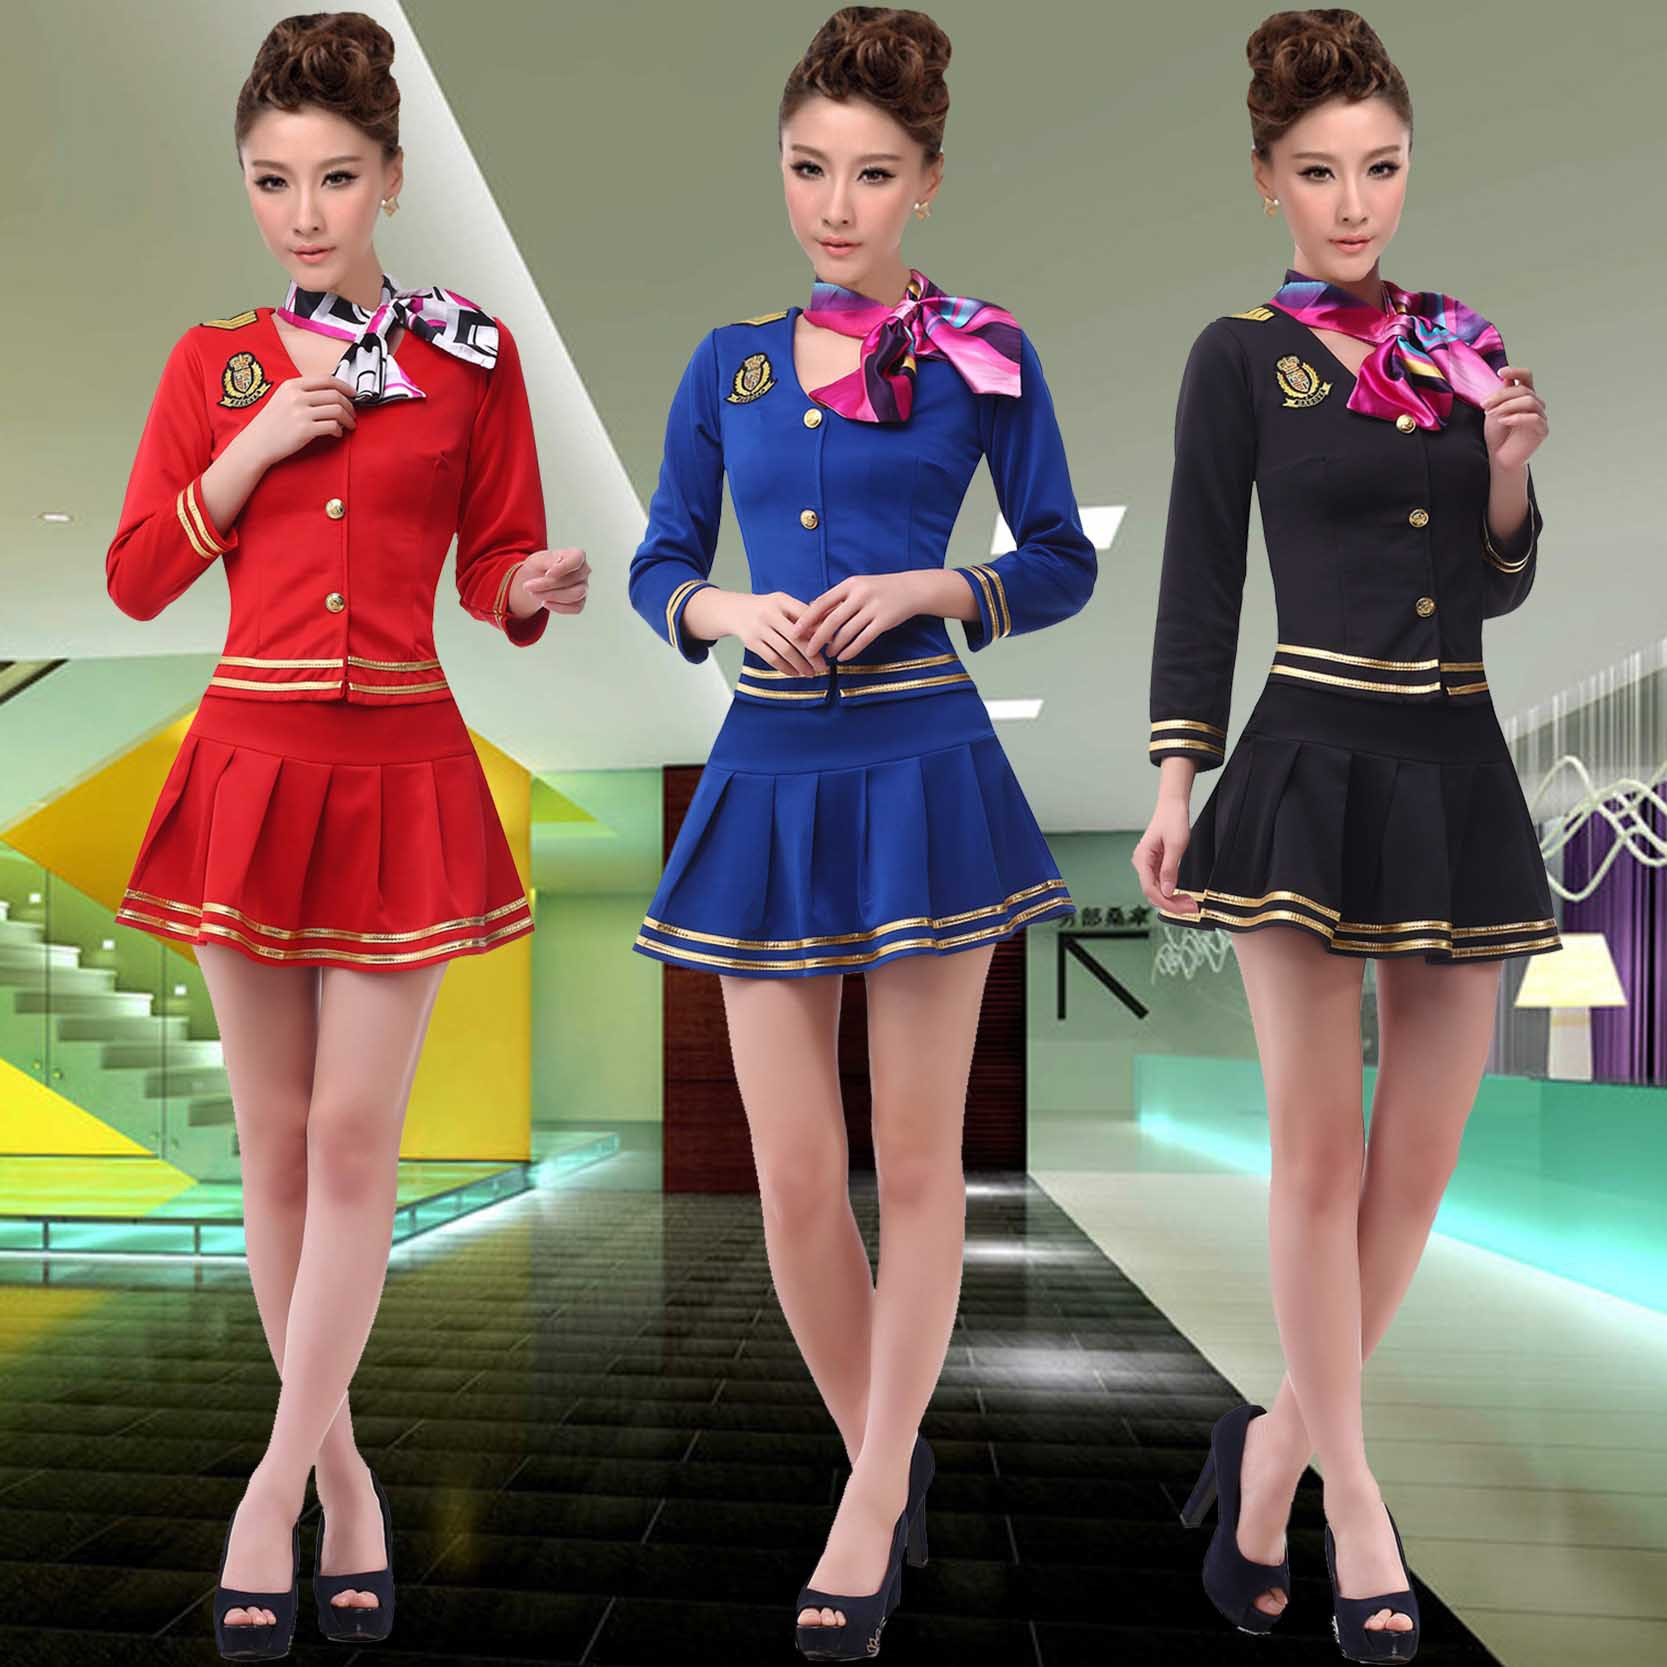 Online Shop long sleeved airline stewardess uniforms beautician